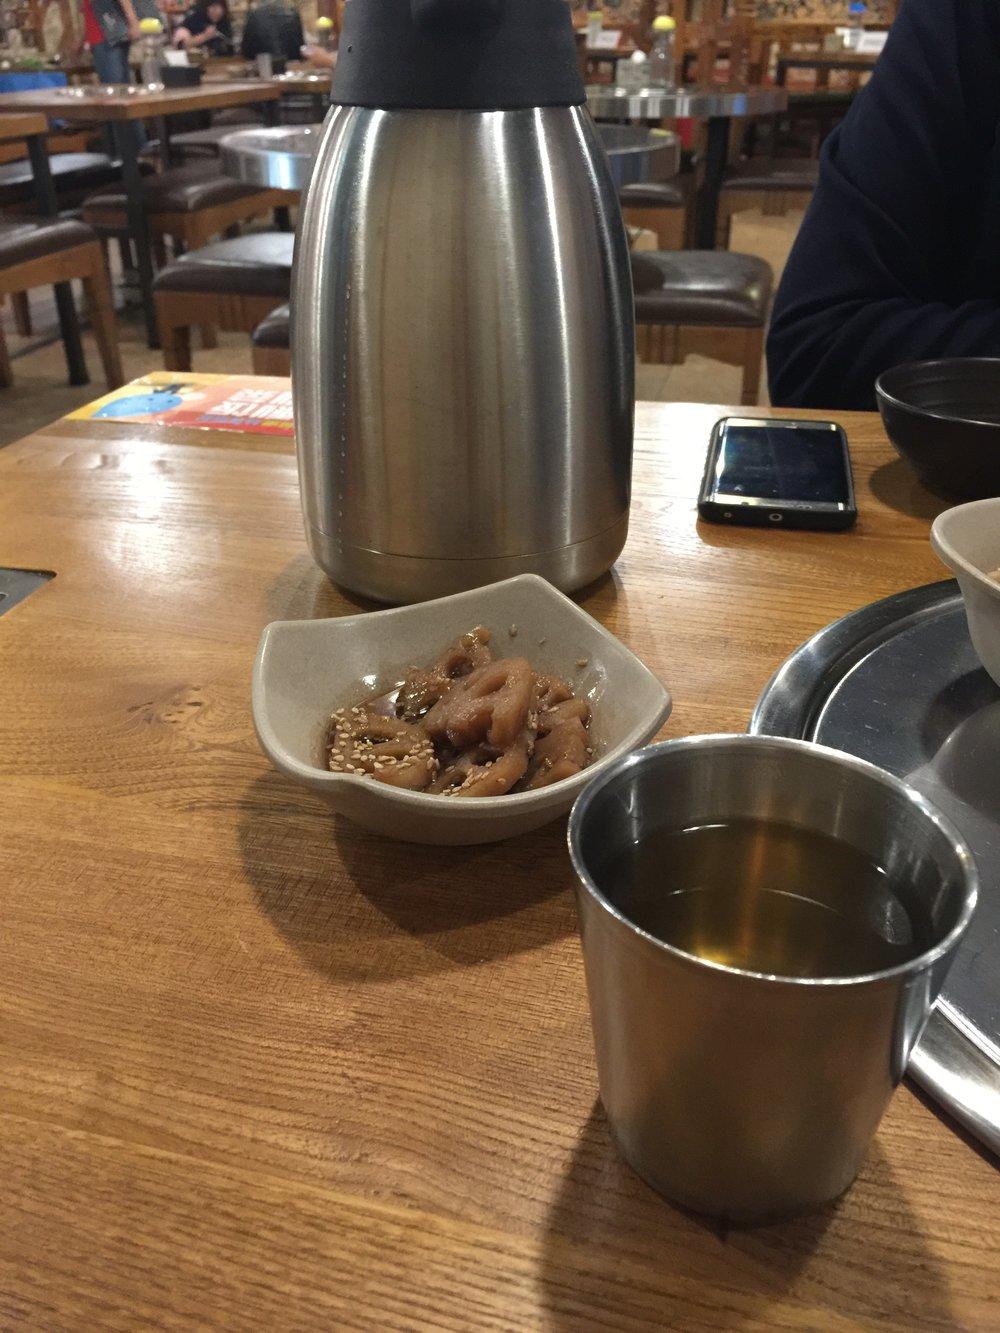 Corn tea was... interesting